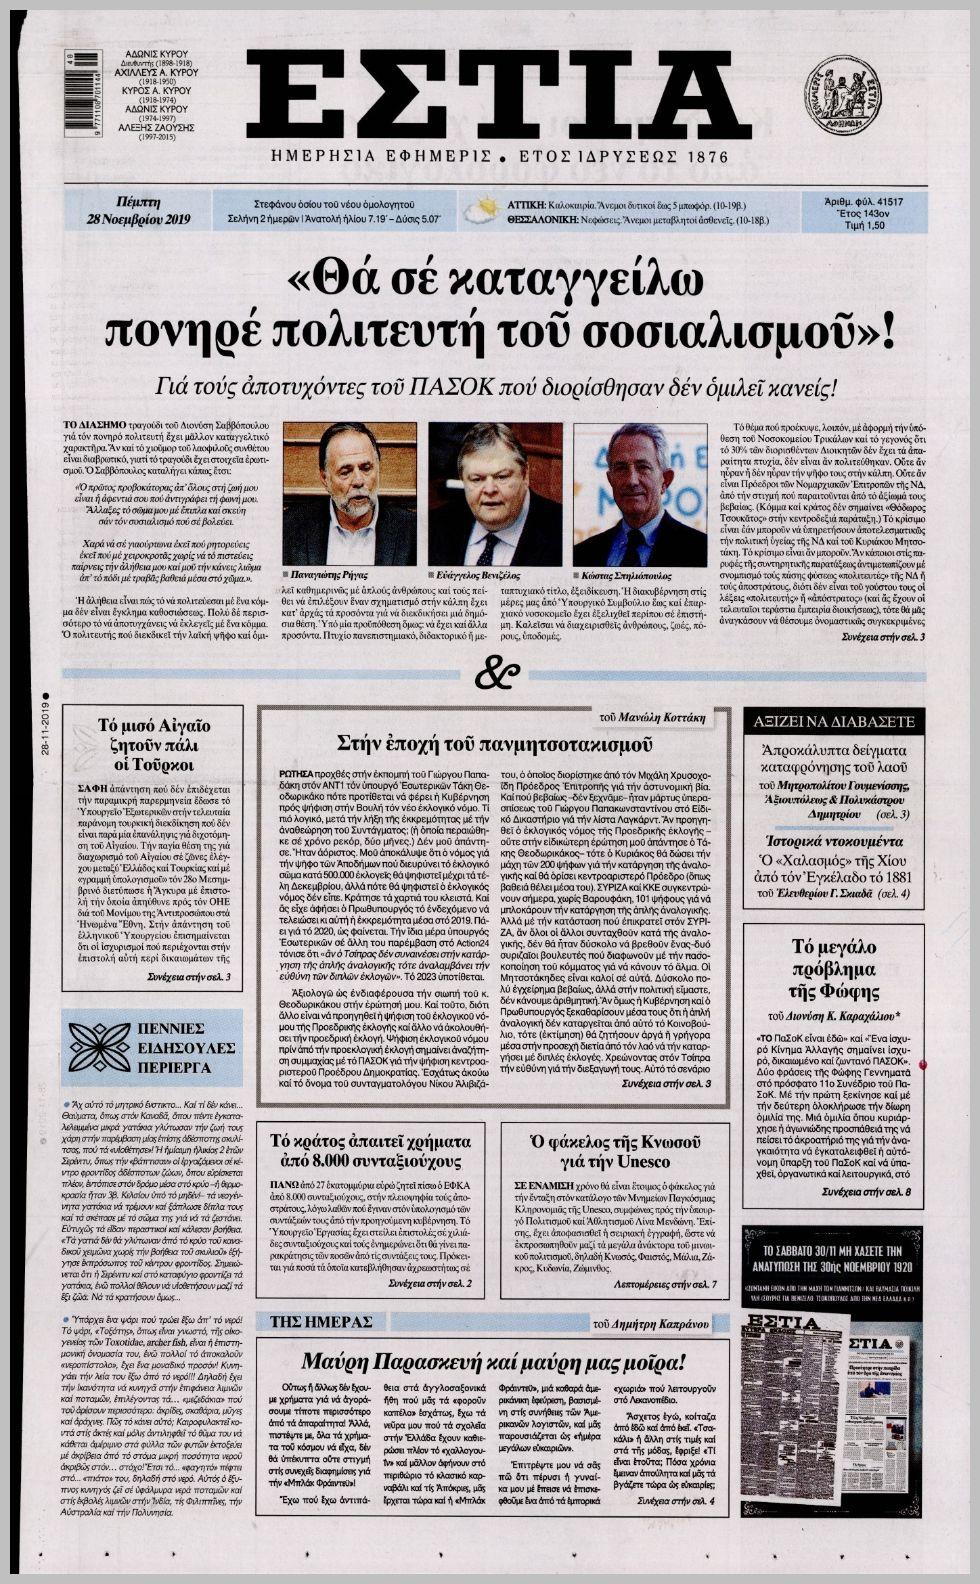 https://protoselida.24media.gr/images/2019/11/28/lrg/20191128_estia_0510.jpg